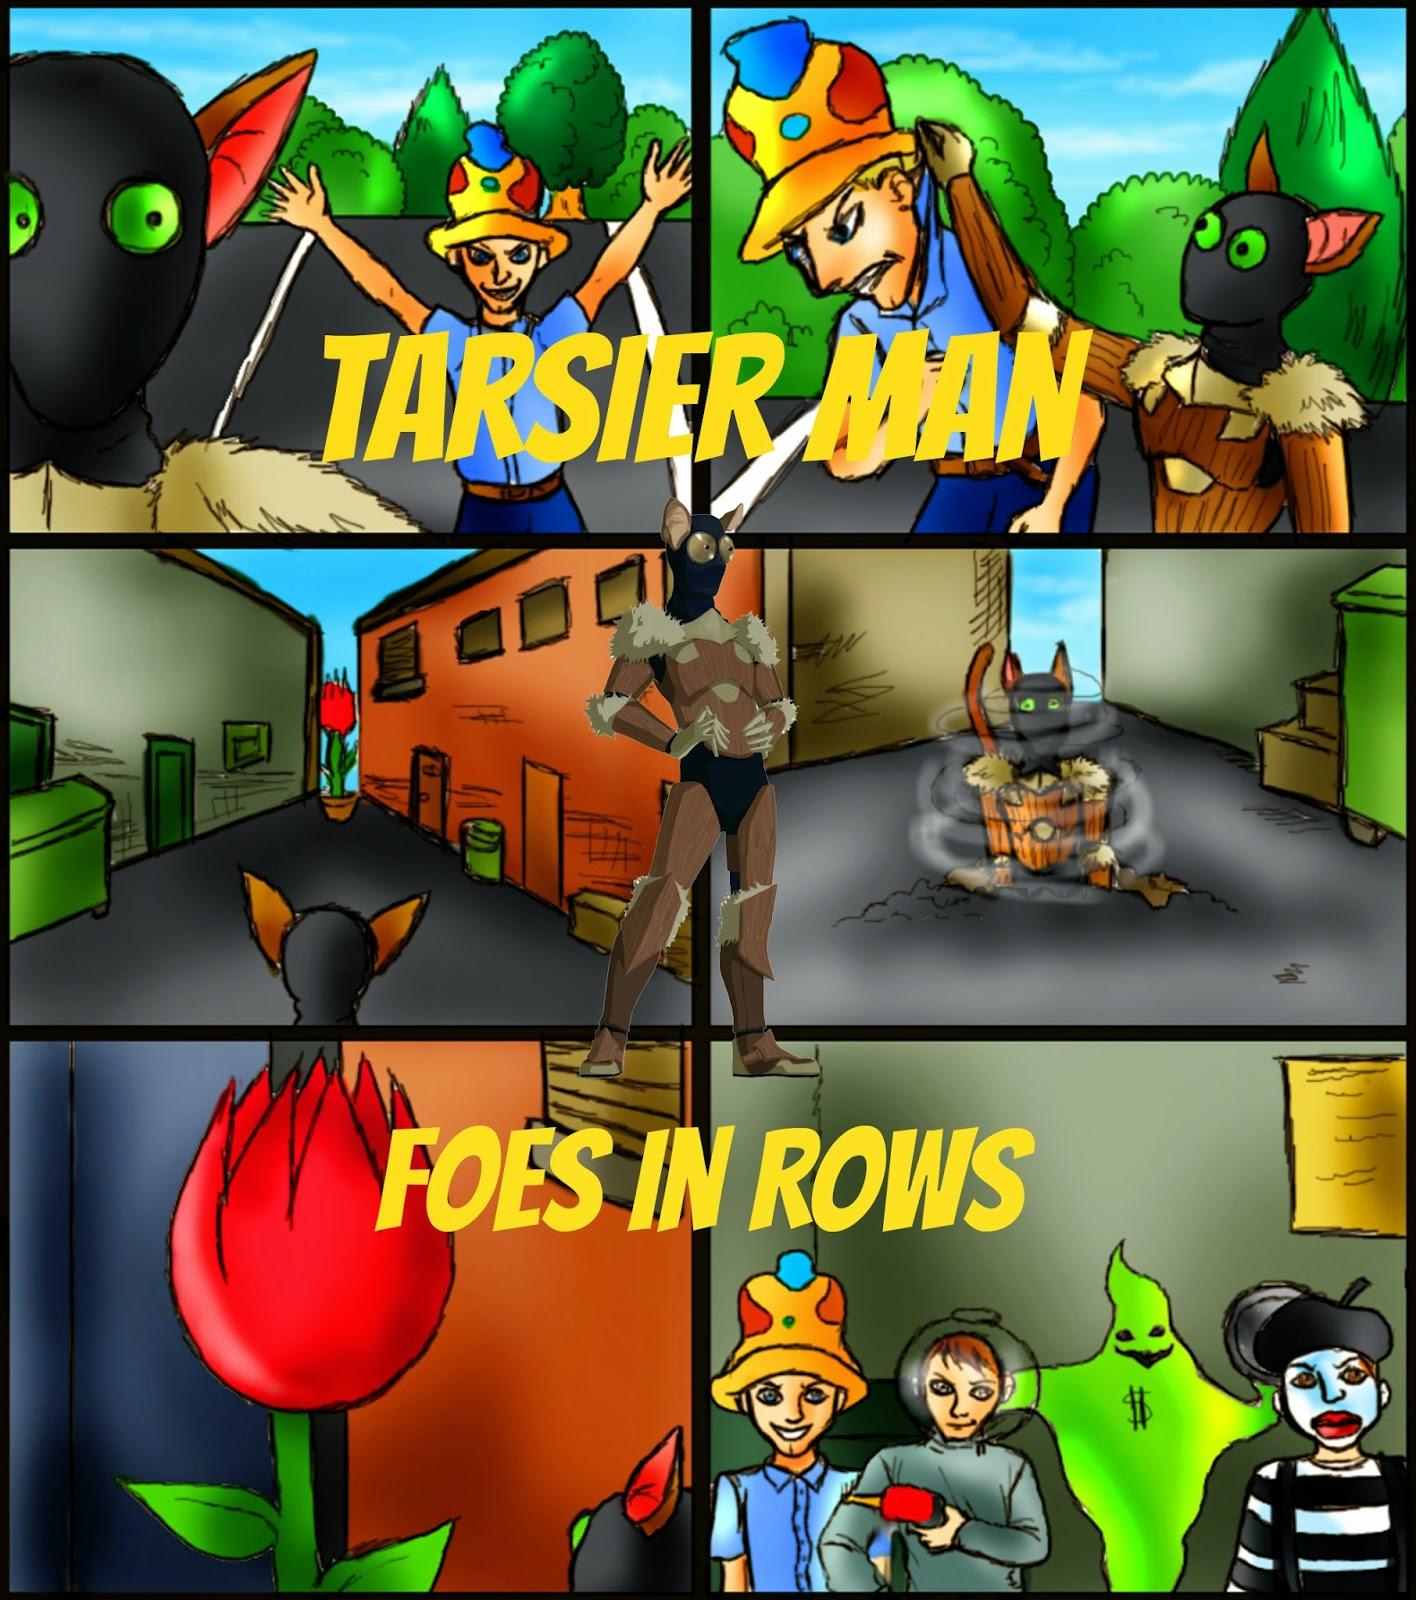 http://www.amazon.com/Tarsier-Man-Foes-Pat-Hatt-ebook/dp/B00UG8UCKY